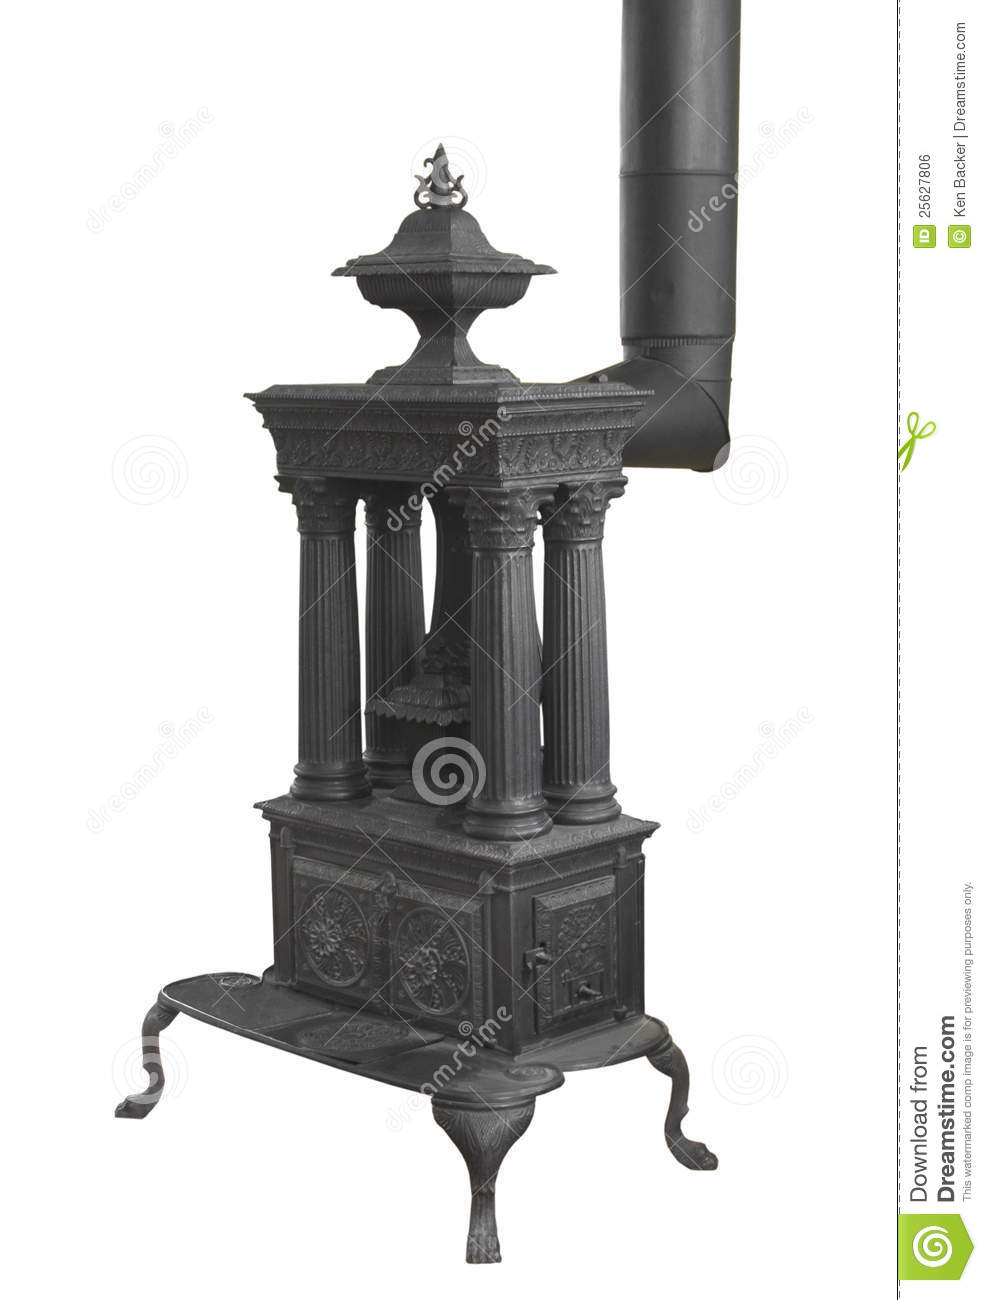 Old Wood Burning Heater Stove Isolated Royalty Free Stock Image.